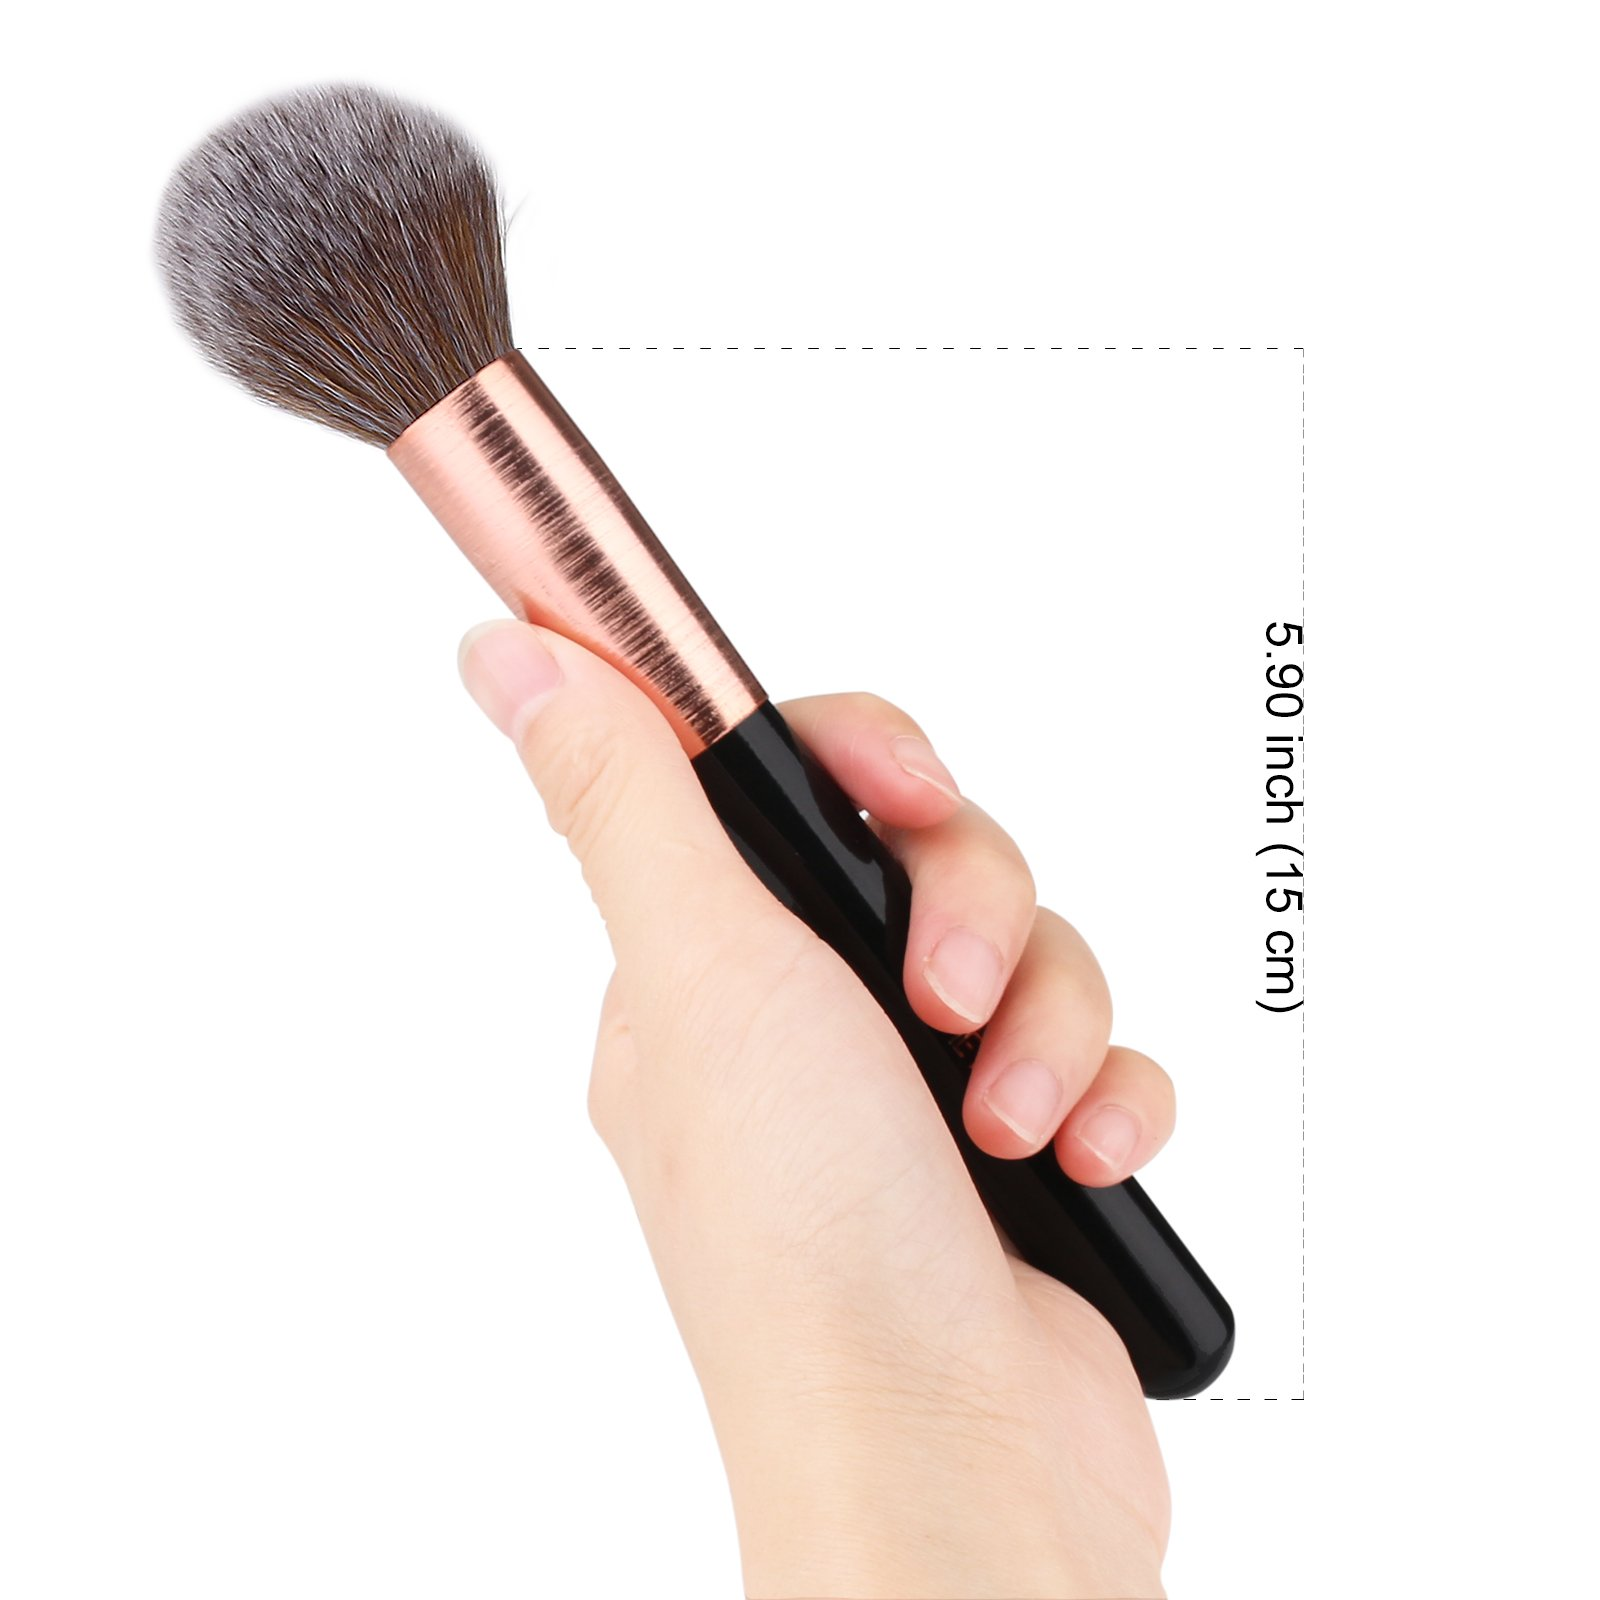 MEYSHAR Powder Blush Makeup Brush Cosmetic Foundation Cream Makeup Tool Professional Large Makeup Brushes